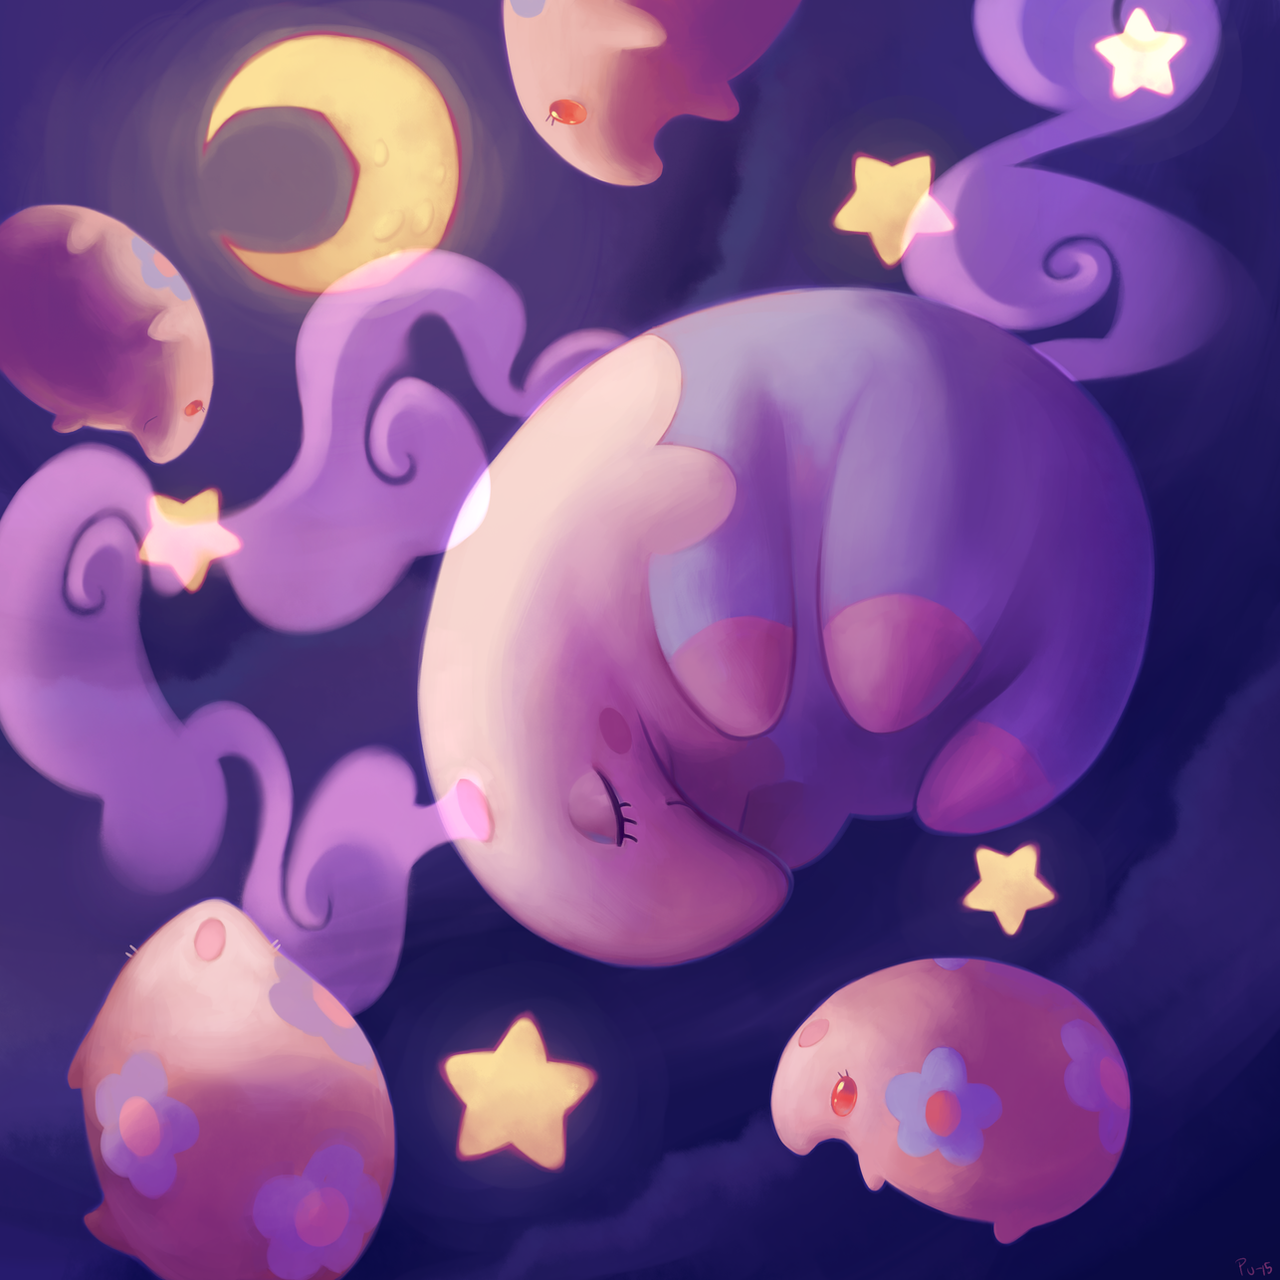 Sweet dreams by purmu